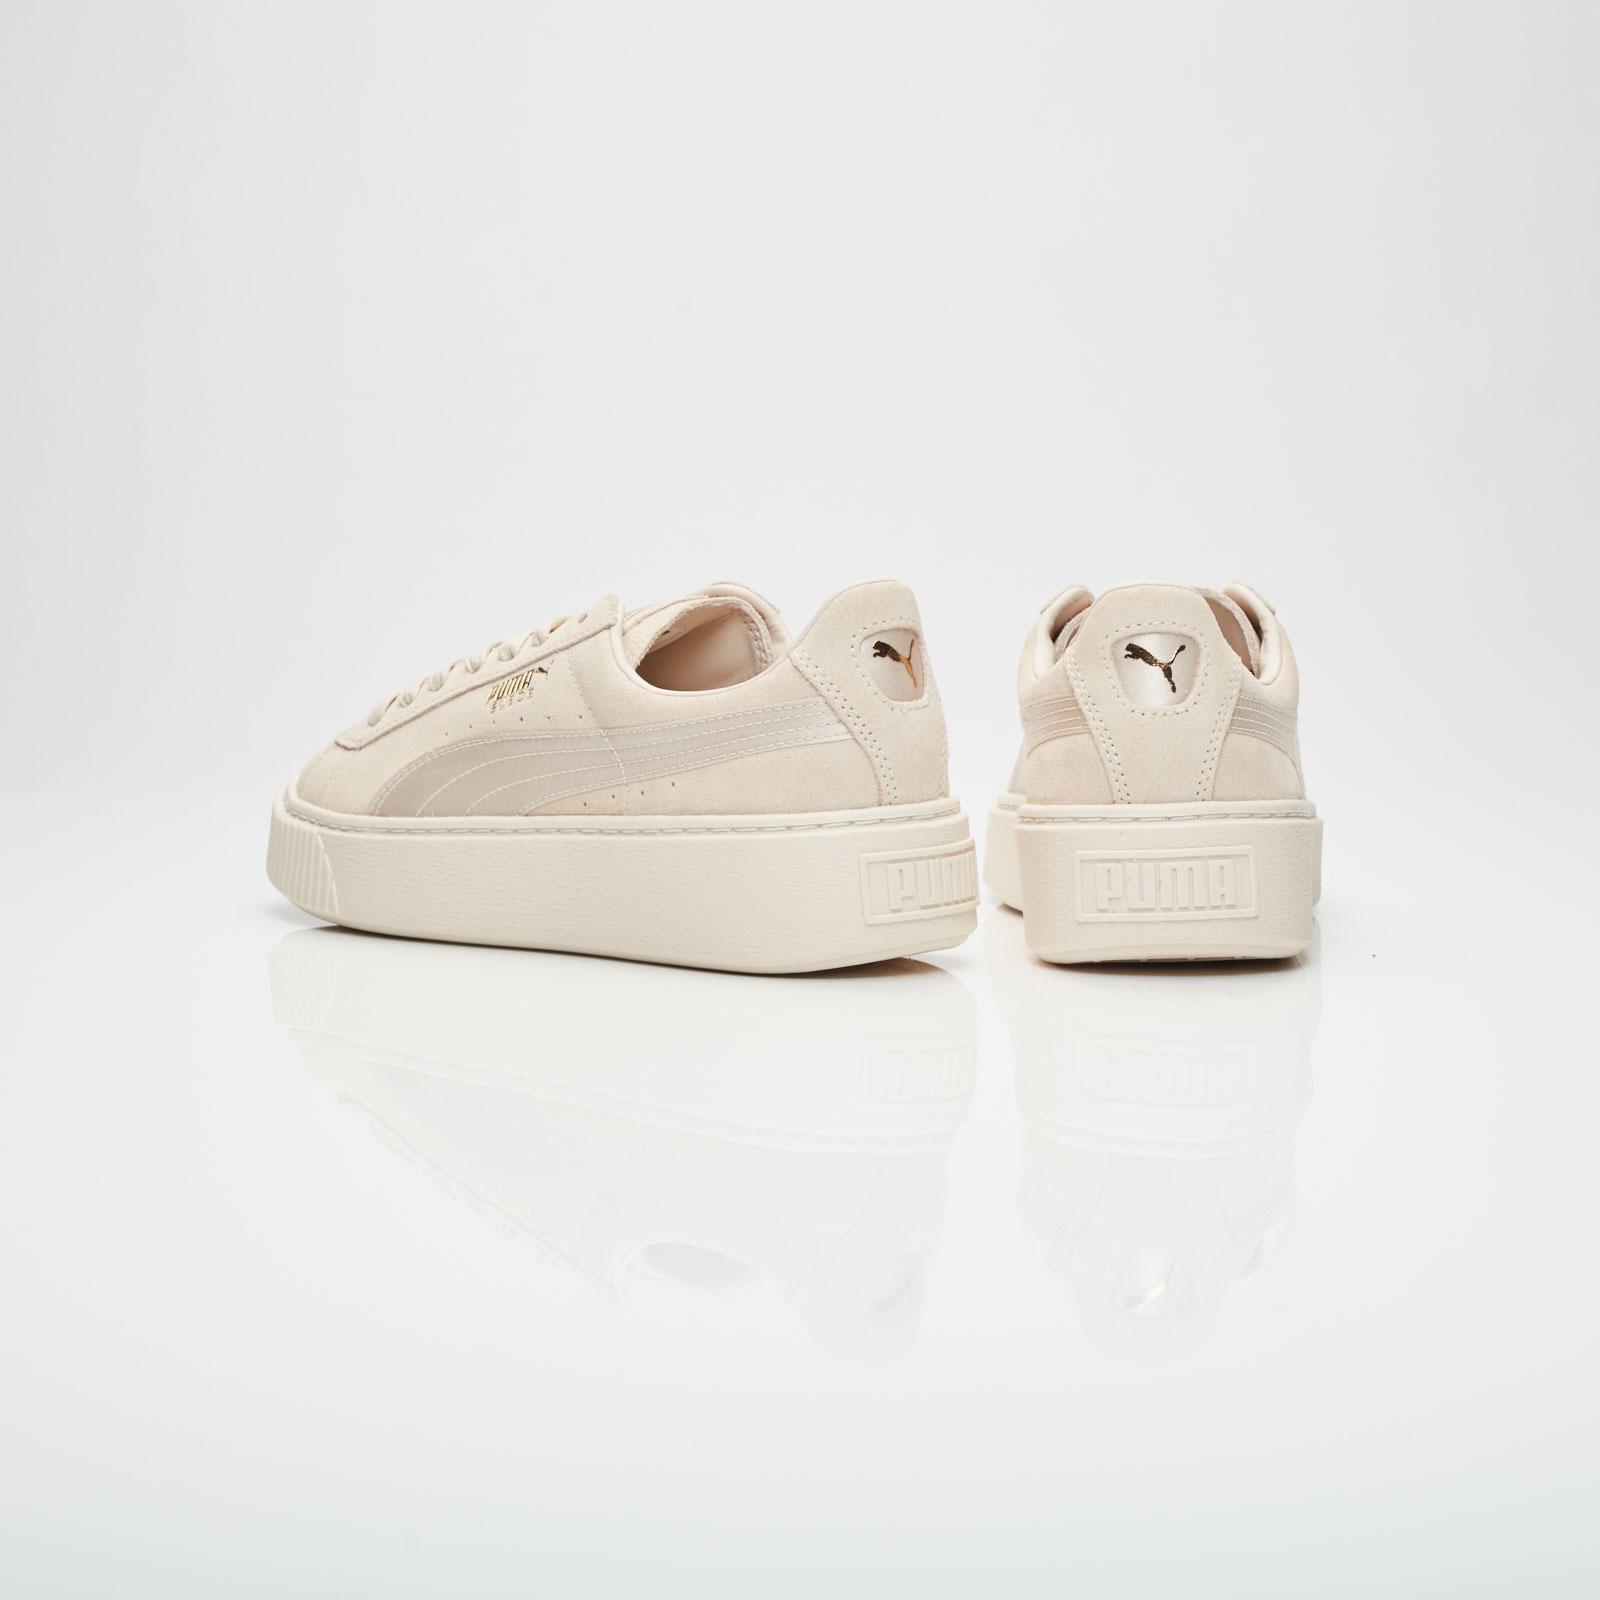 new style bb178 18ebc Puma Suede Platform Satin Wns - 365828-02 - Sneakersnstuff ...